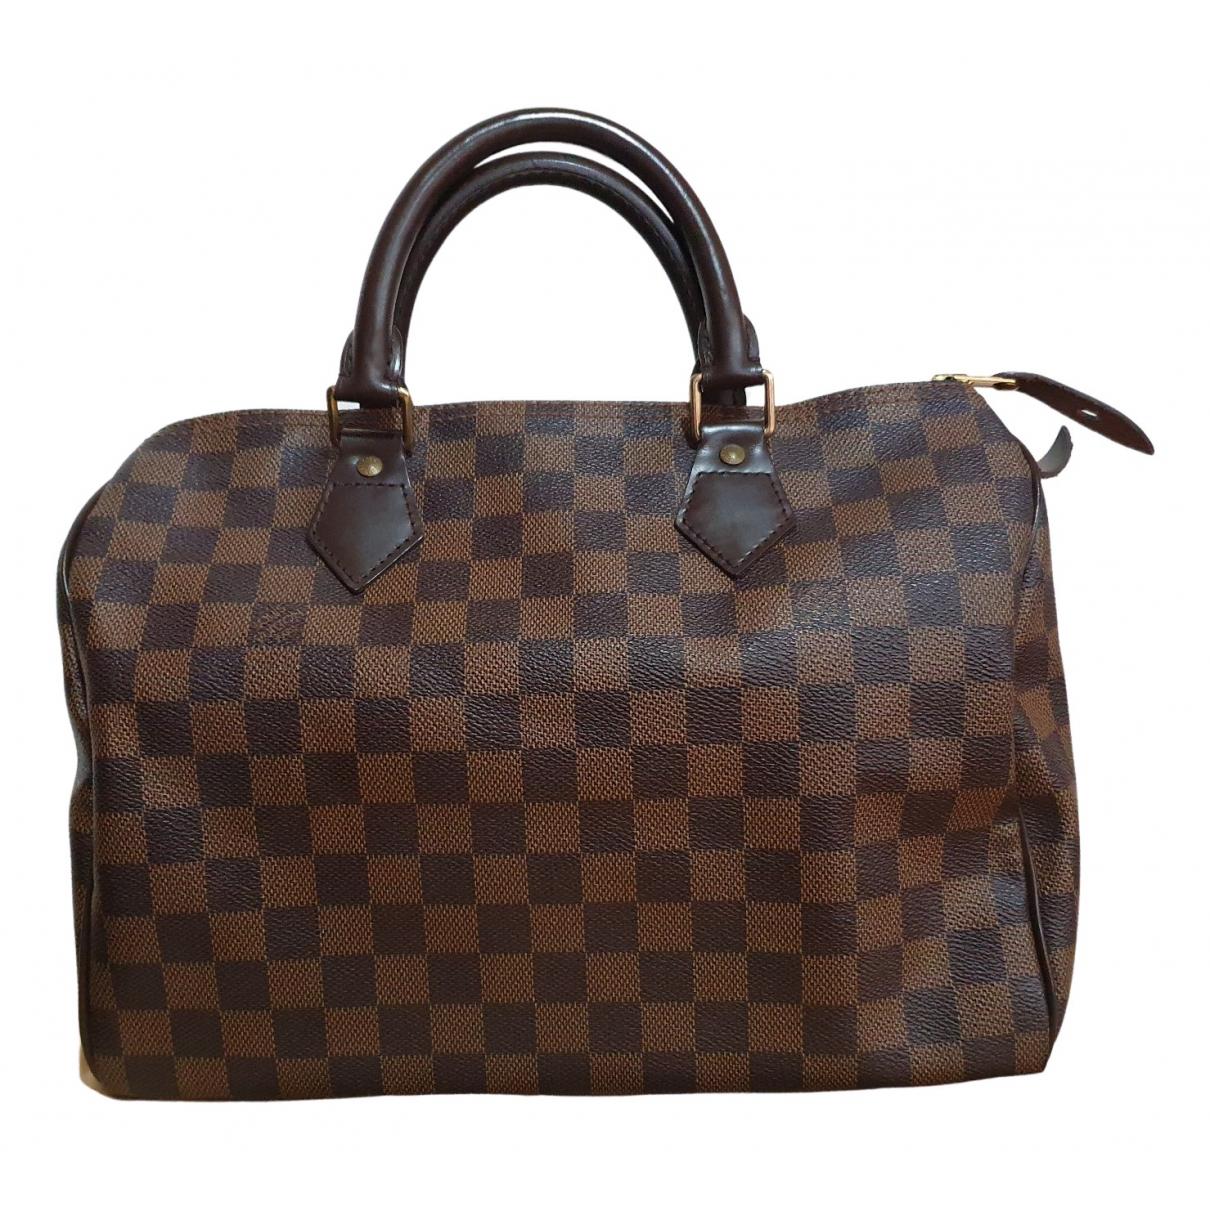 Bandolera Speedy de Lona Louis Vuitton